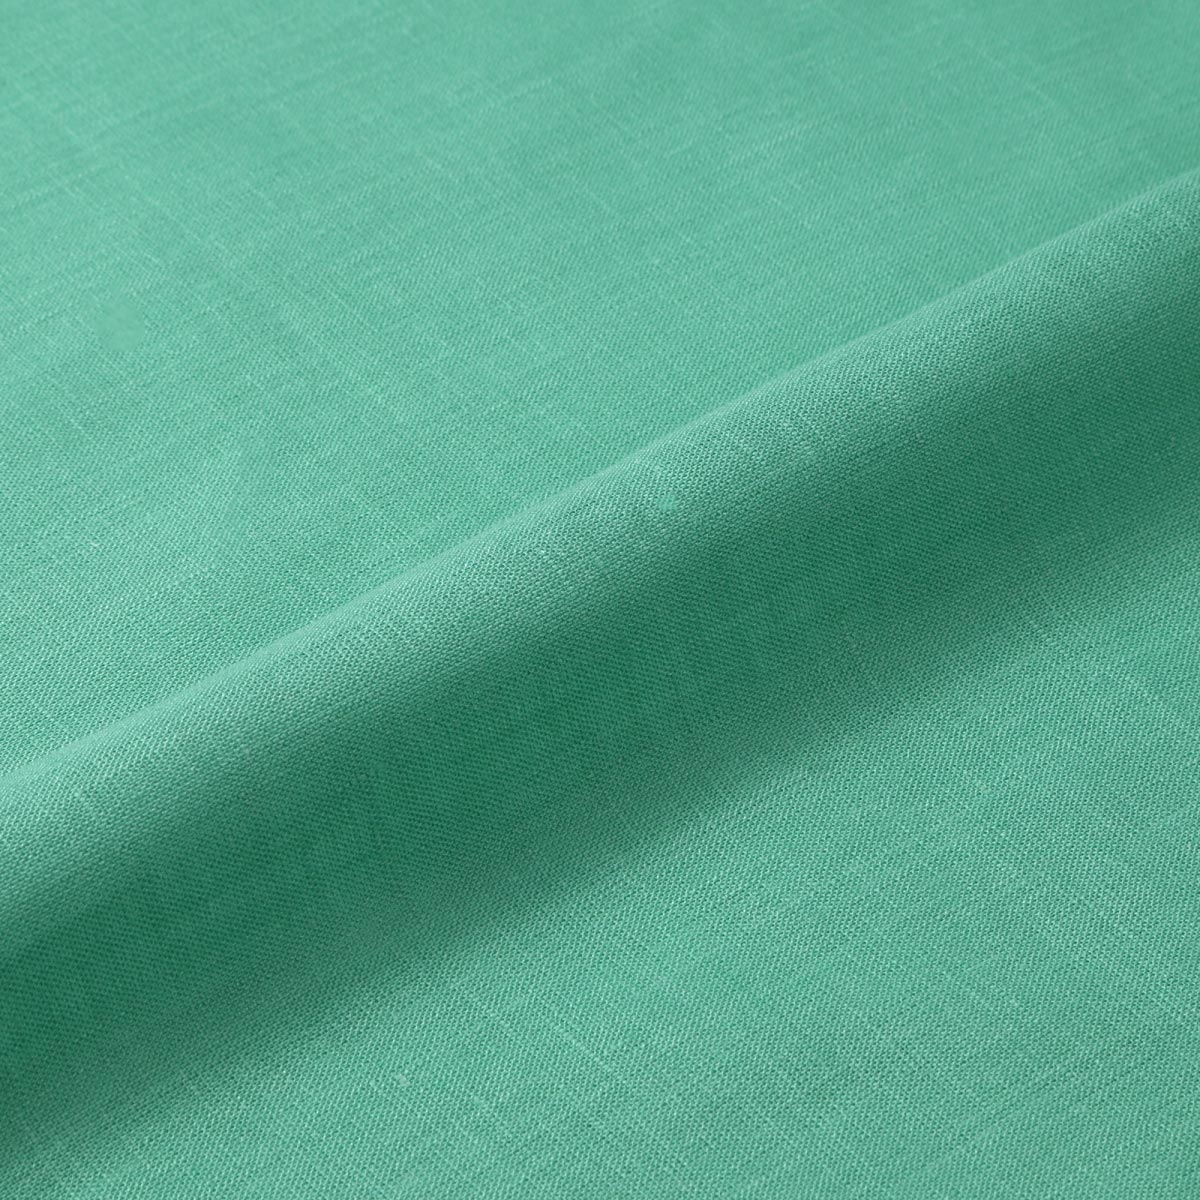 150cm巾 【リネン100%生地】 グリーン 無地 普通地 1m単位 GR-393 【ワンピース、スカート、シャツ、カーテンに最適】